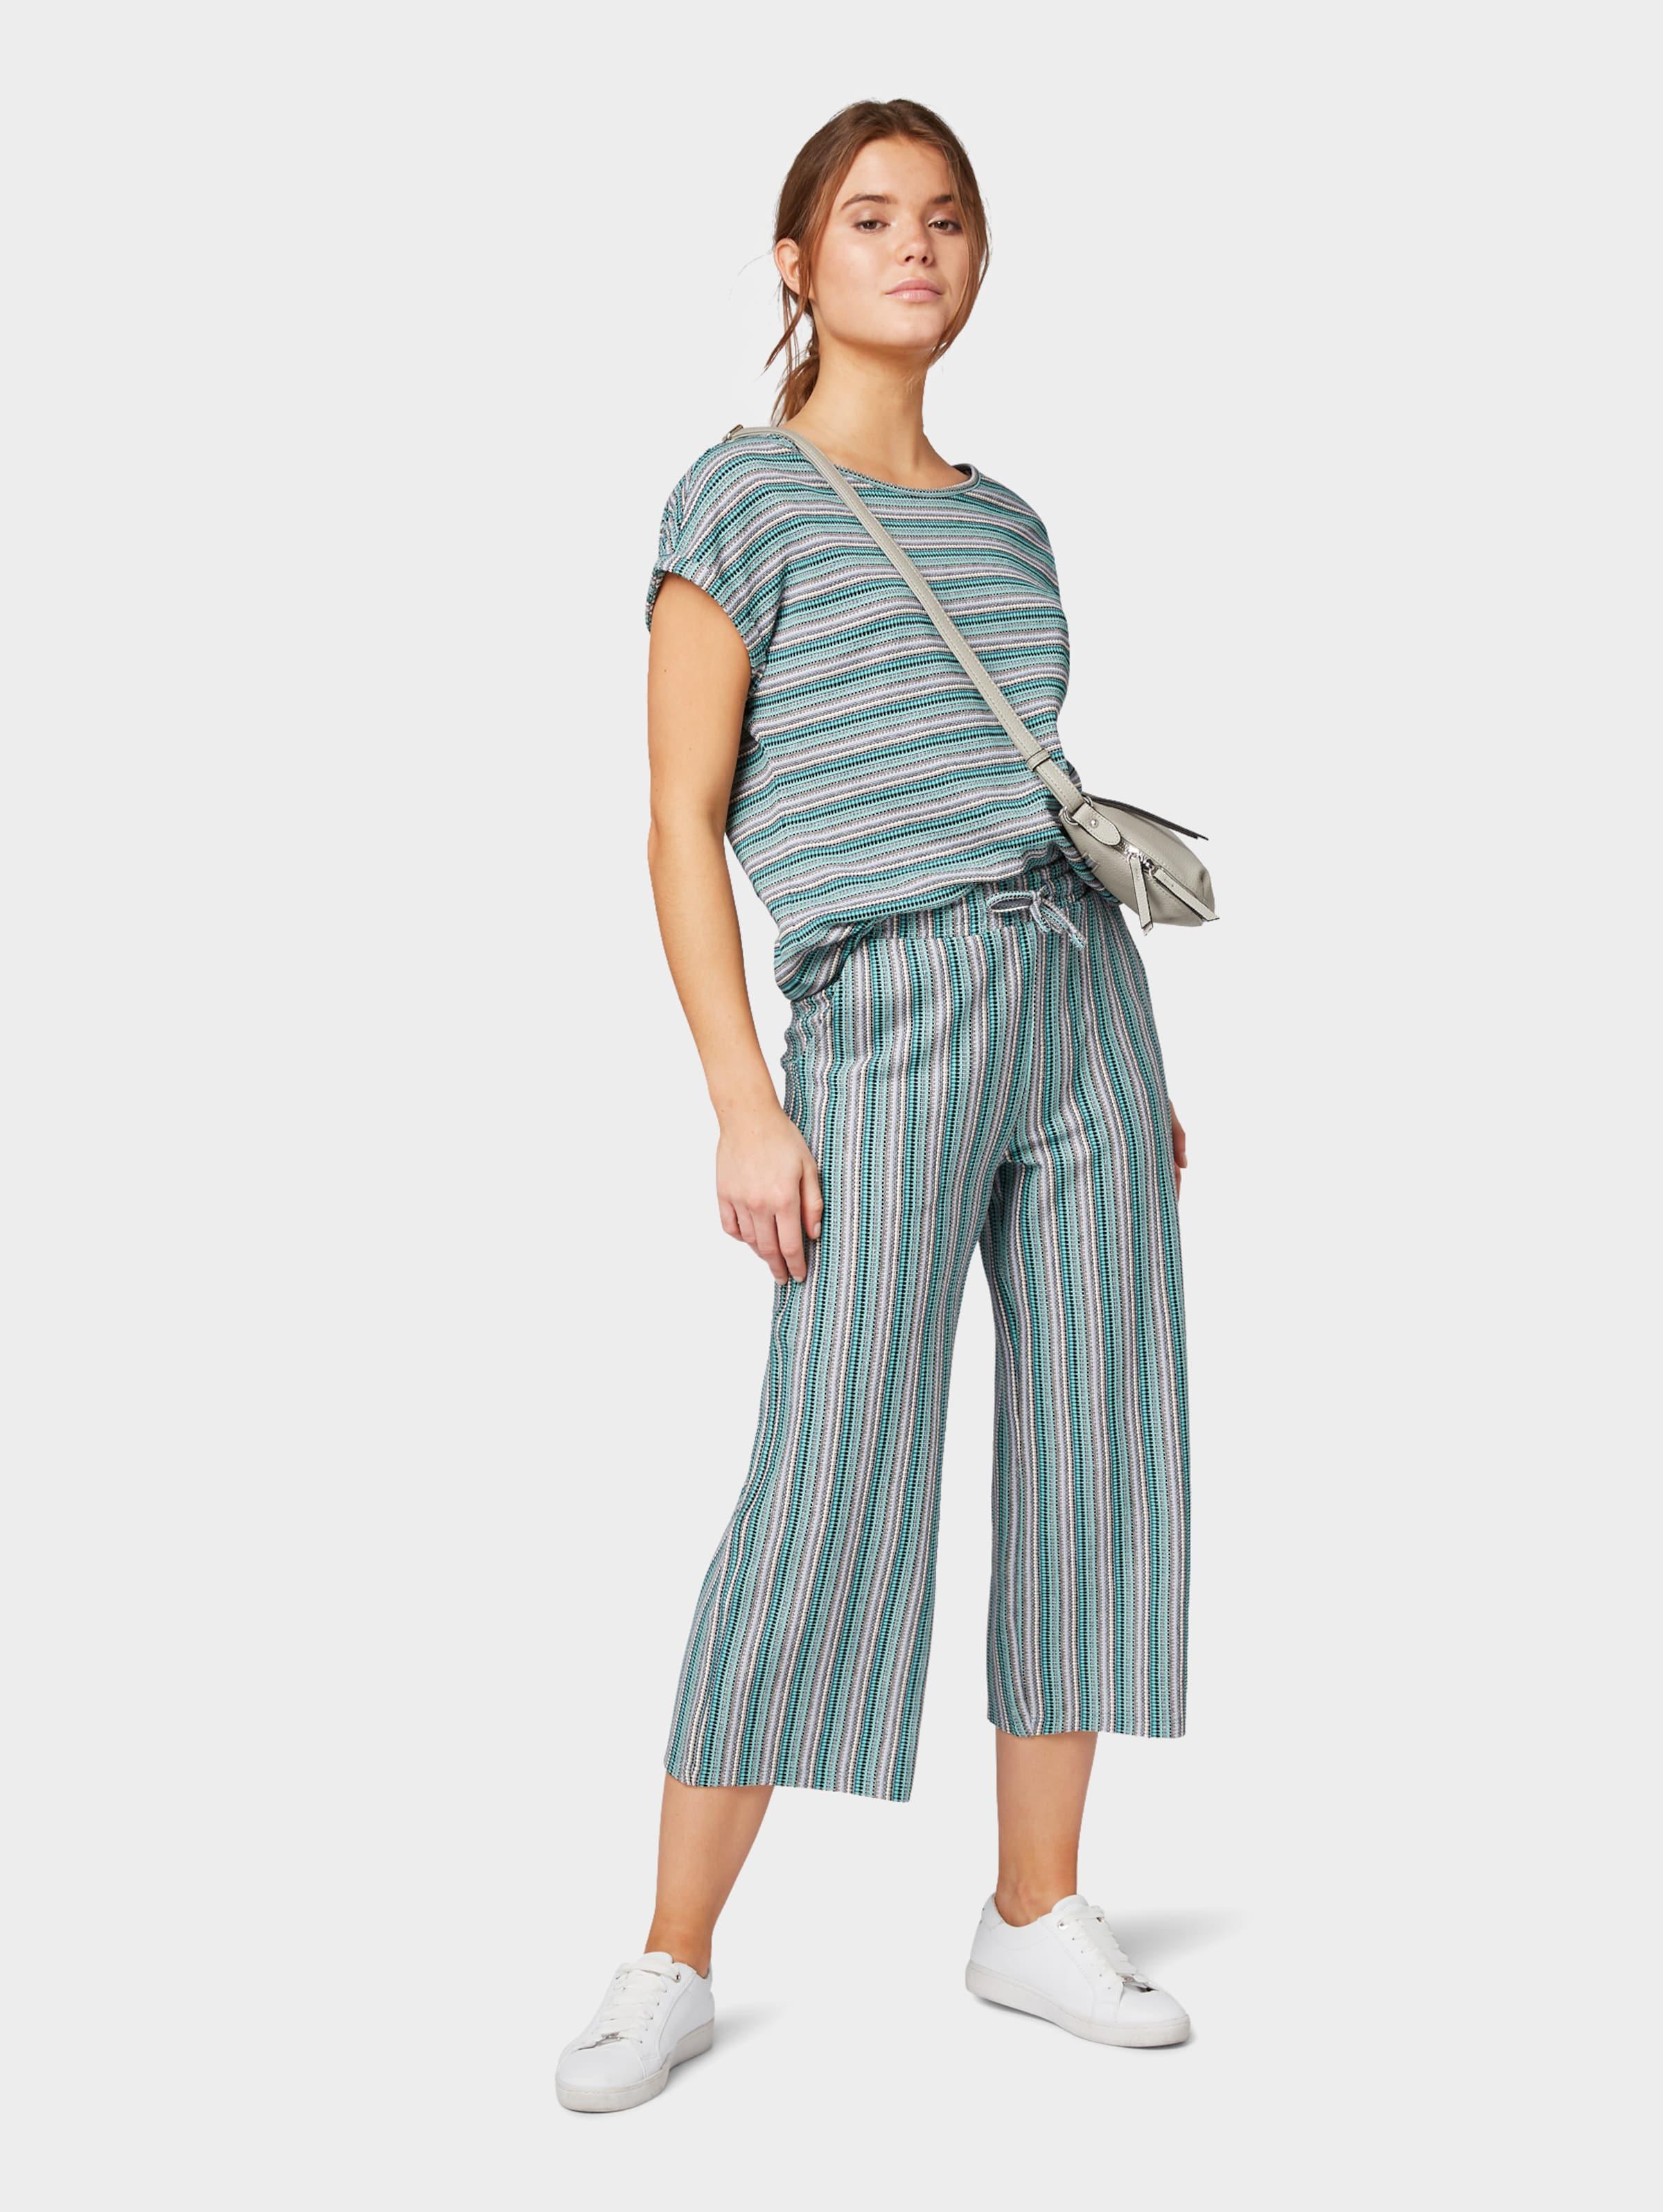 Jade Schwarz Culotte HellgrauPetrol Tailor In Tom fmIY76yvbg